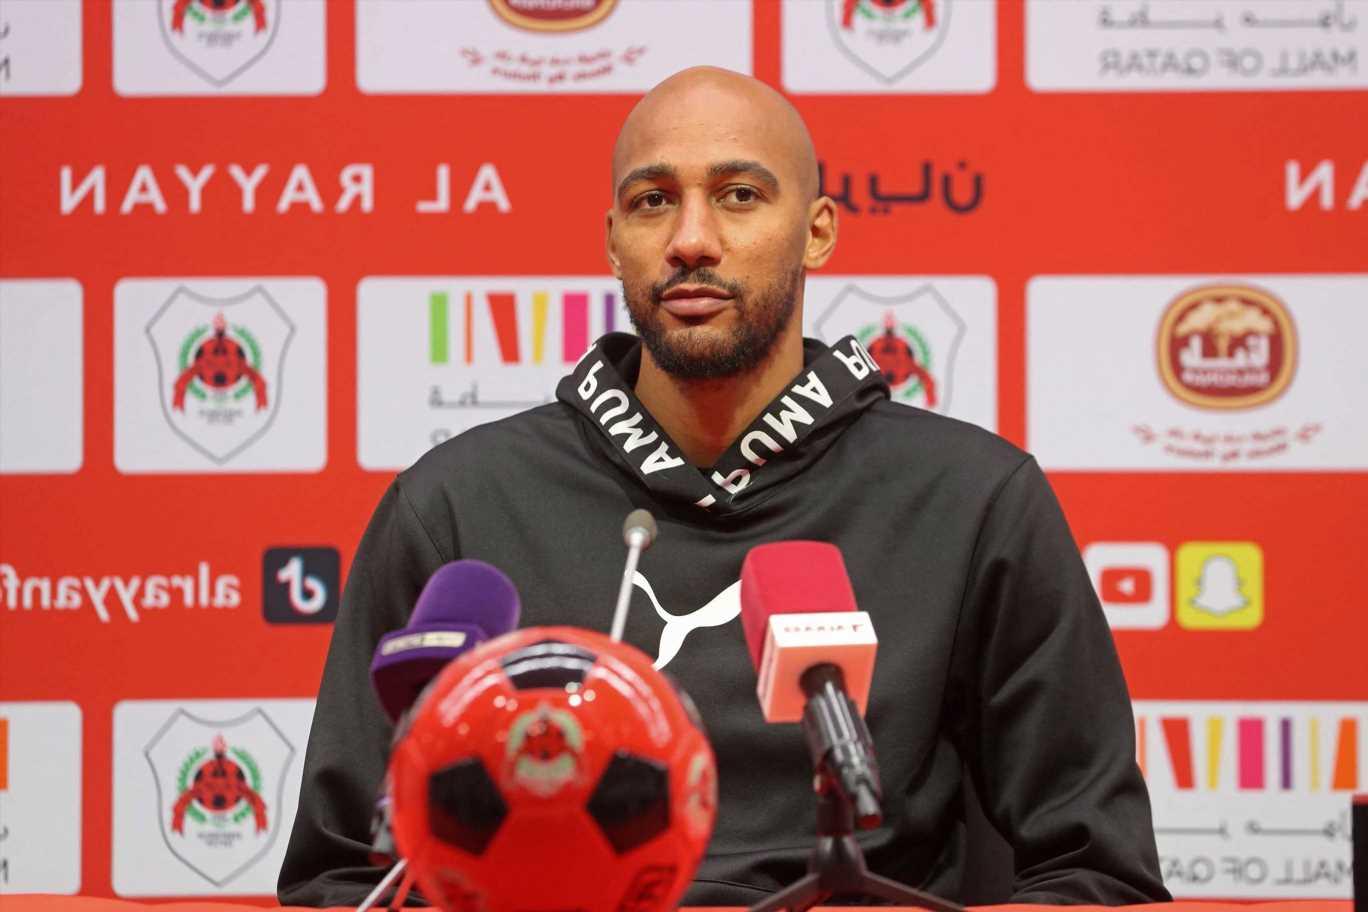 Ex-Stoke star and World Cup winner Steven Nzonzi joins Qatari club Al Rayyan on free transfer after leaving Roma